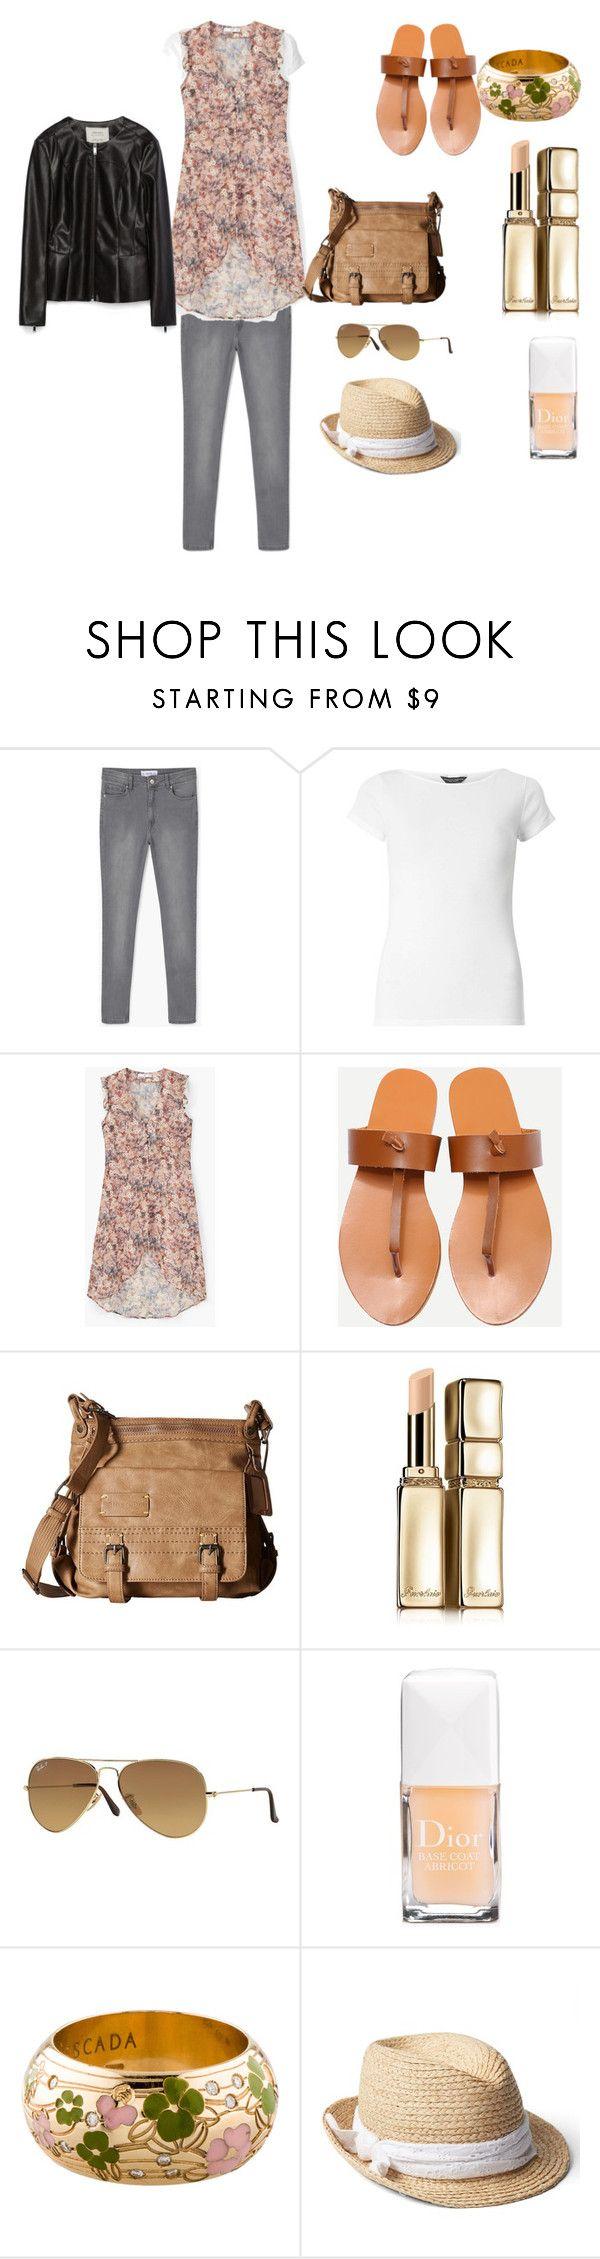 """Not that warm summer outfit"" by janka-dzurillova on Polyvore featuring MANGO, Dorothy Perkins, Sherpani, Guerlain, Ray-Ban, Christian Dior, ESCADA, Gap and Zara"